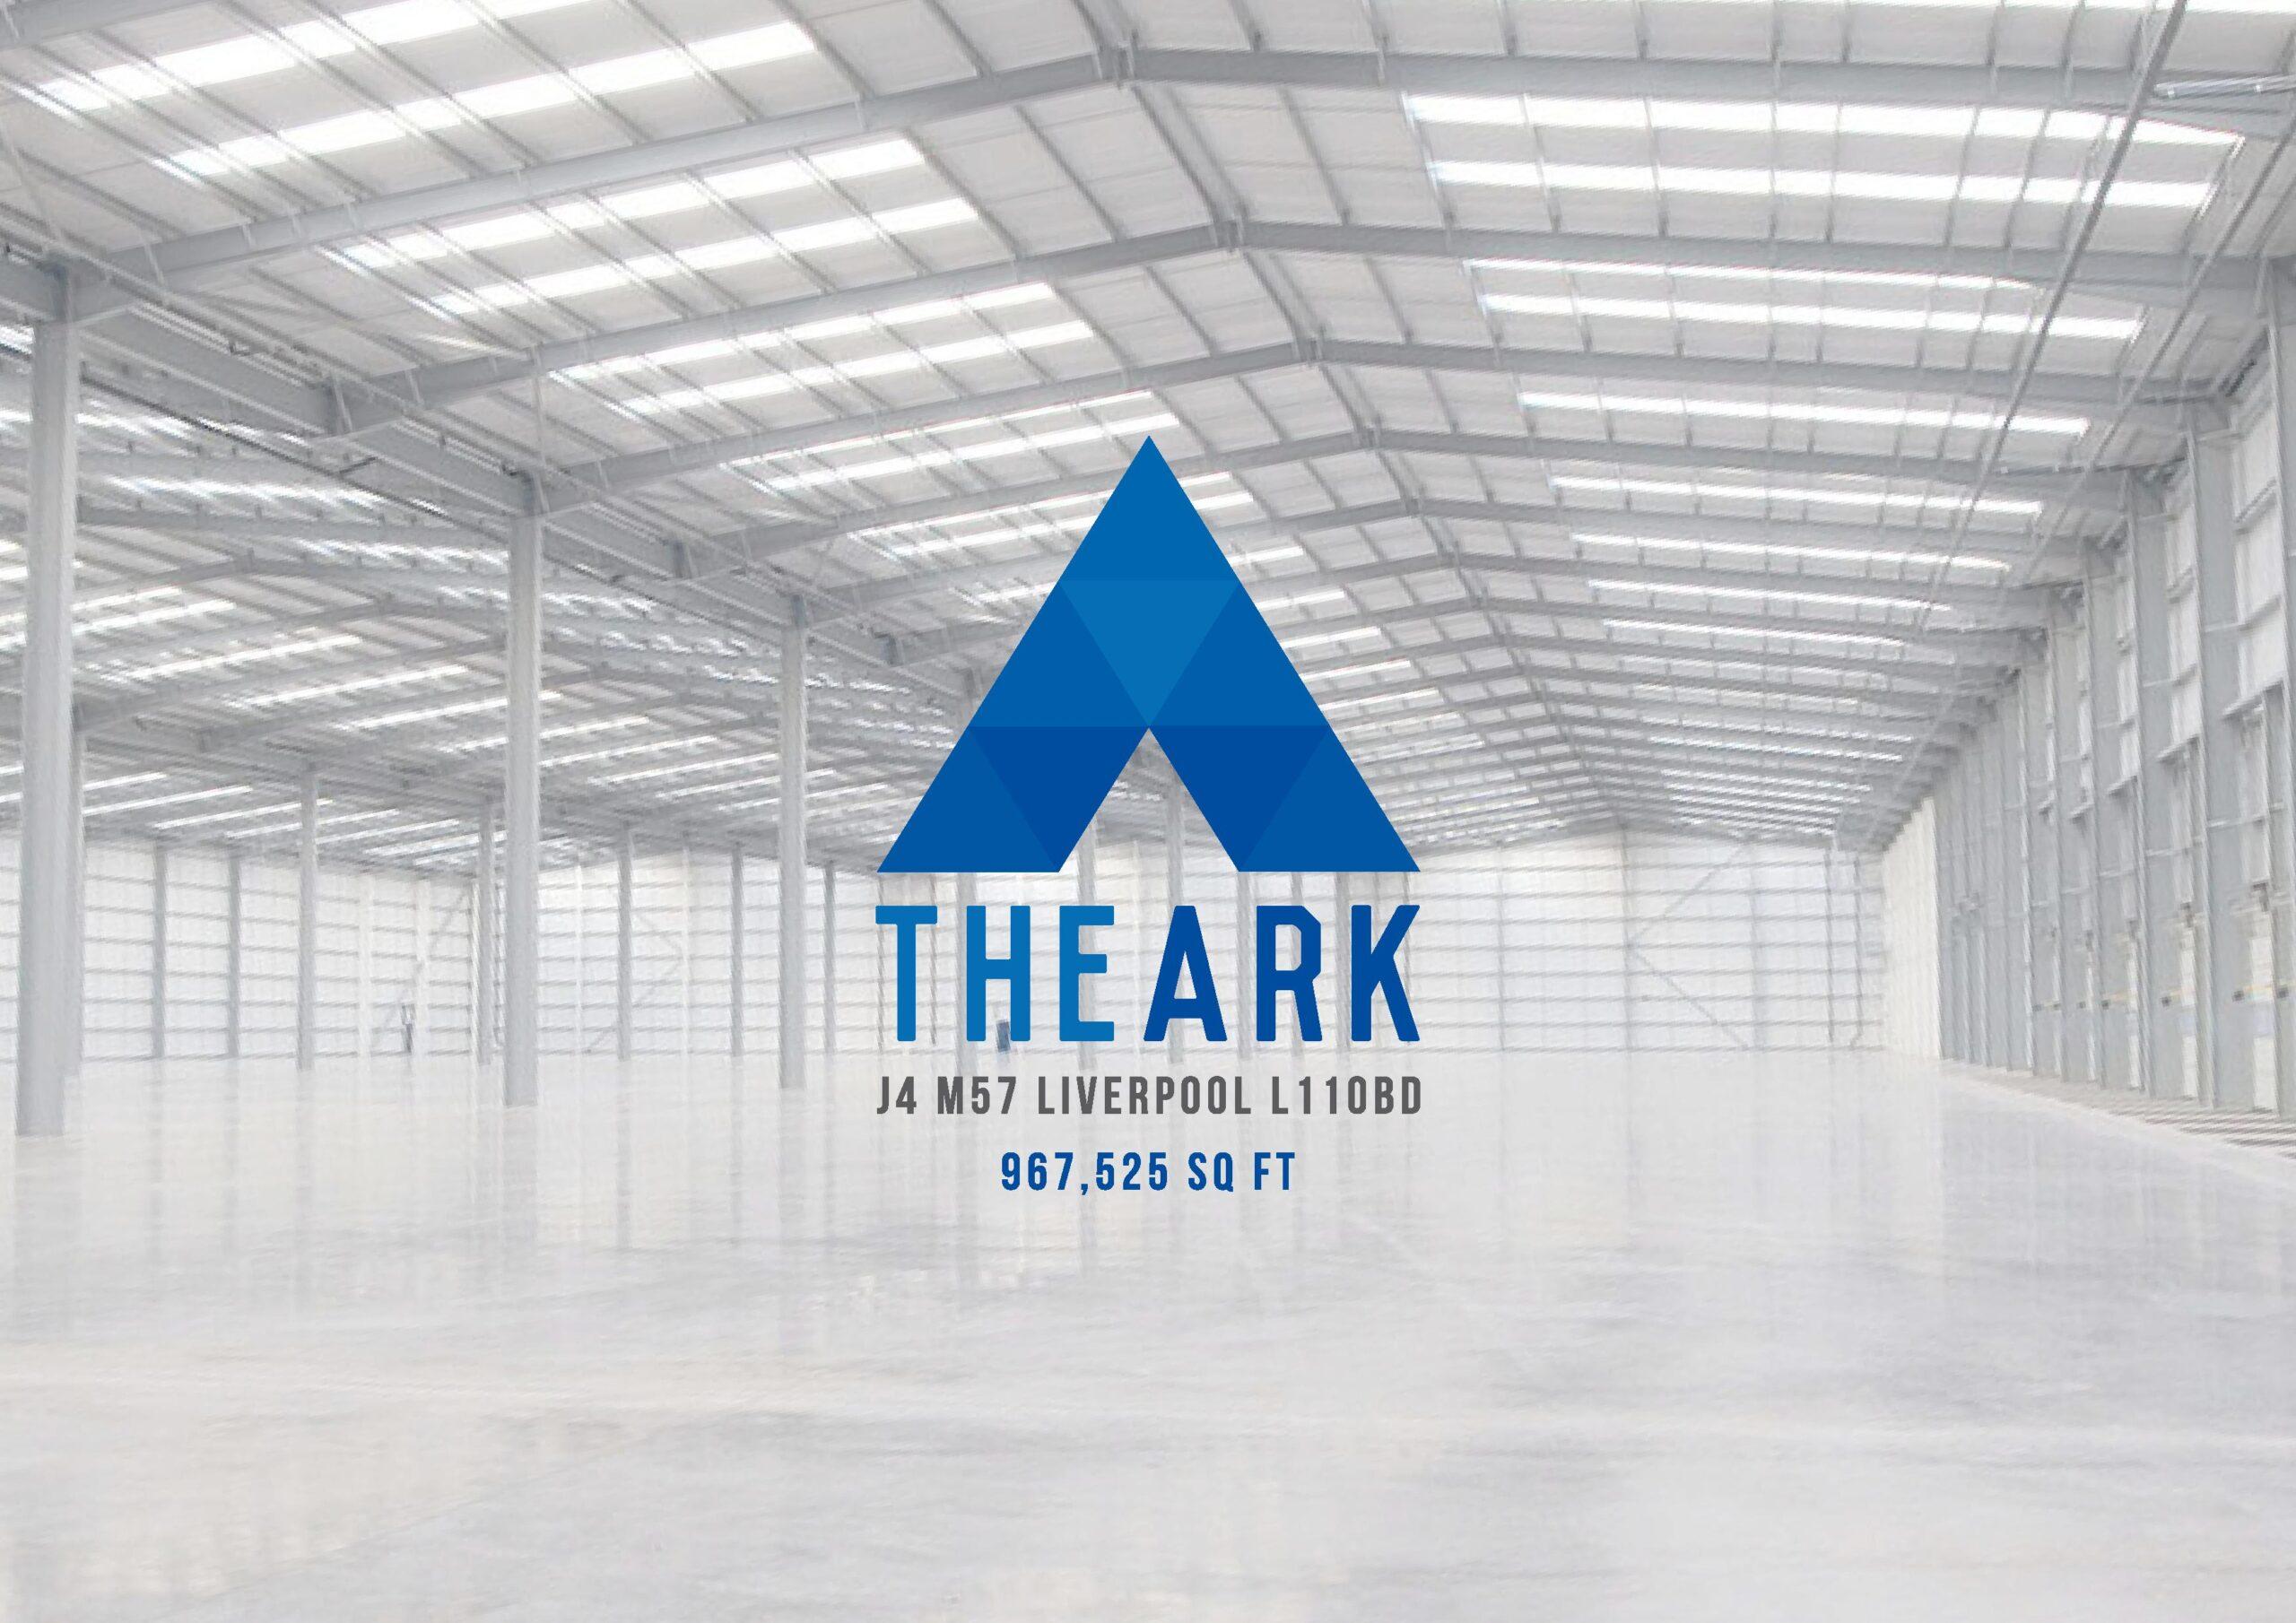 The ark thumbnail